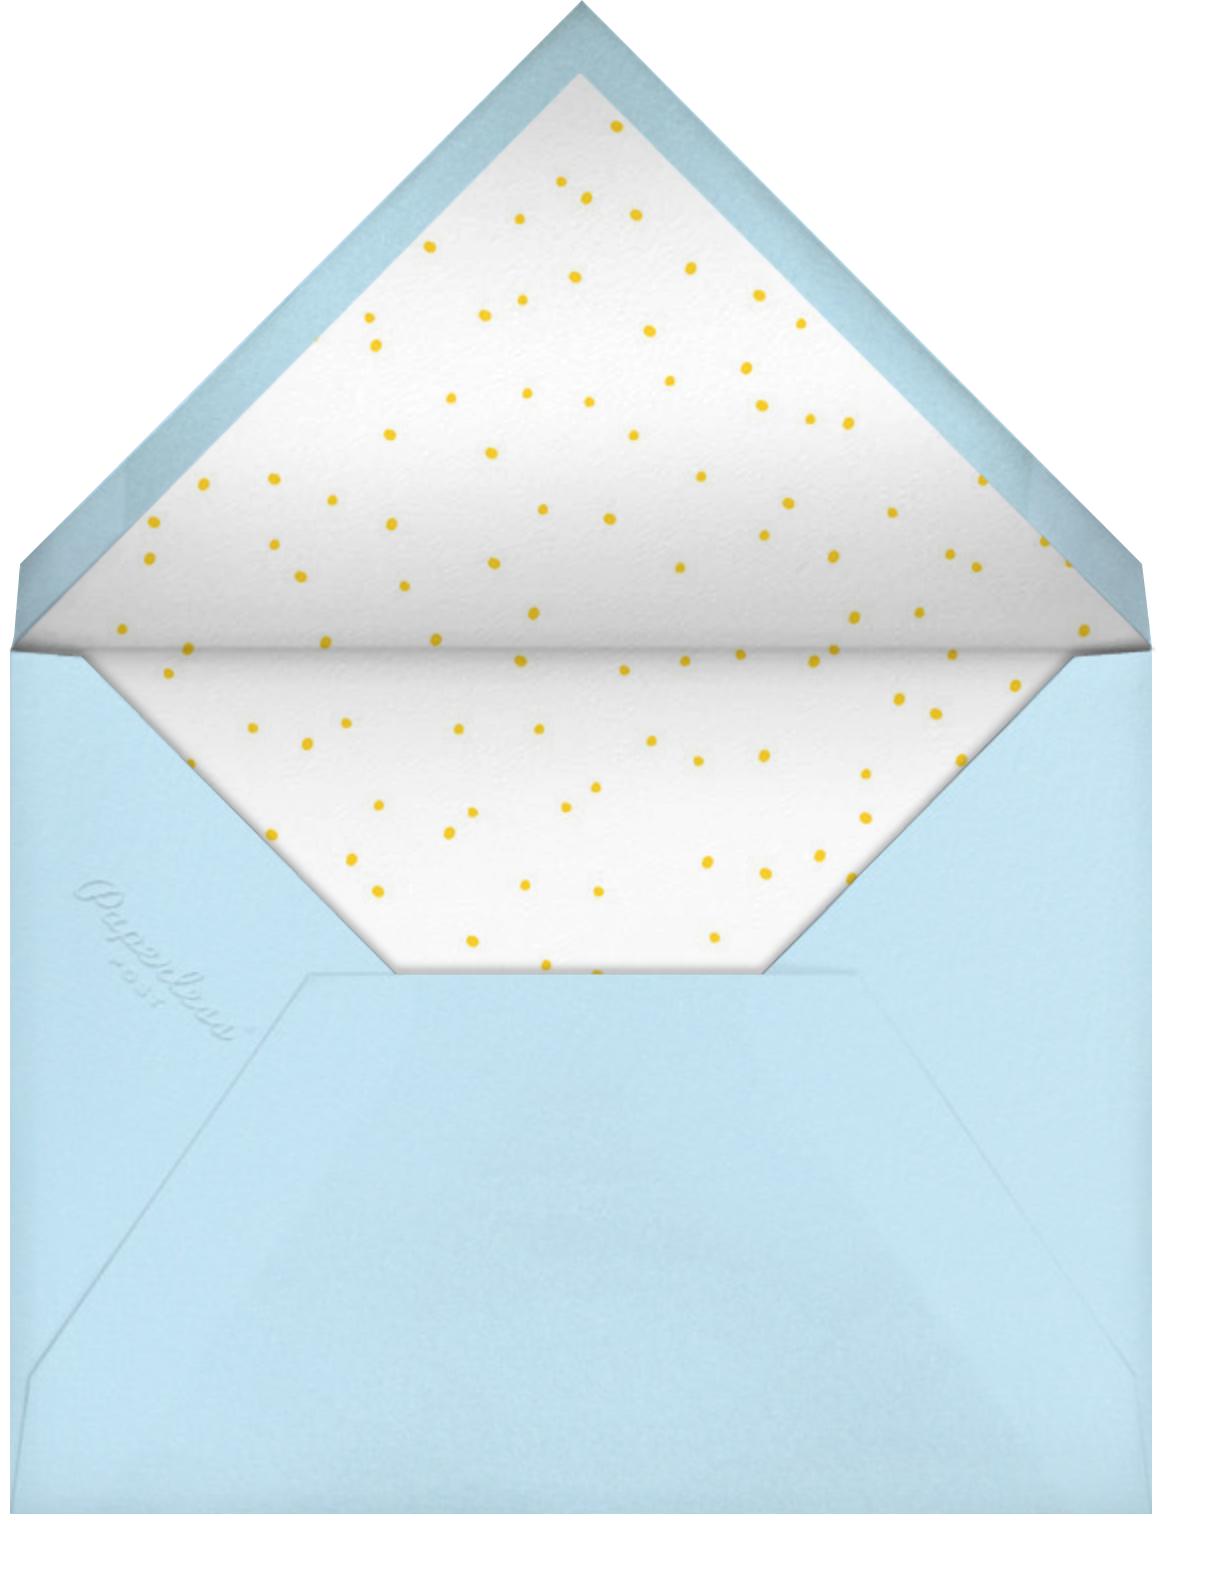 Smiling Skies Photo - Little Cube - Birth - envelope back